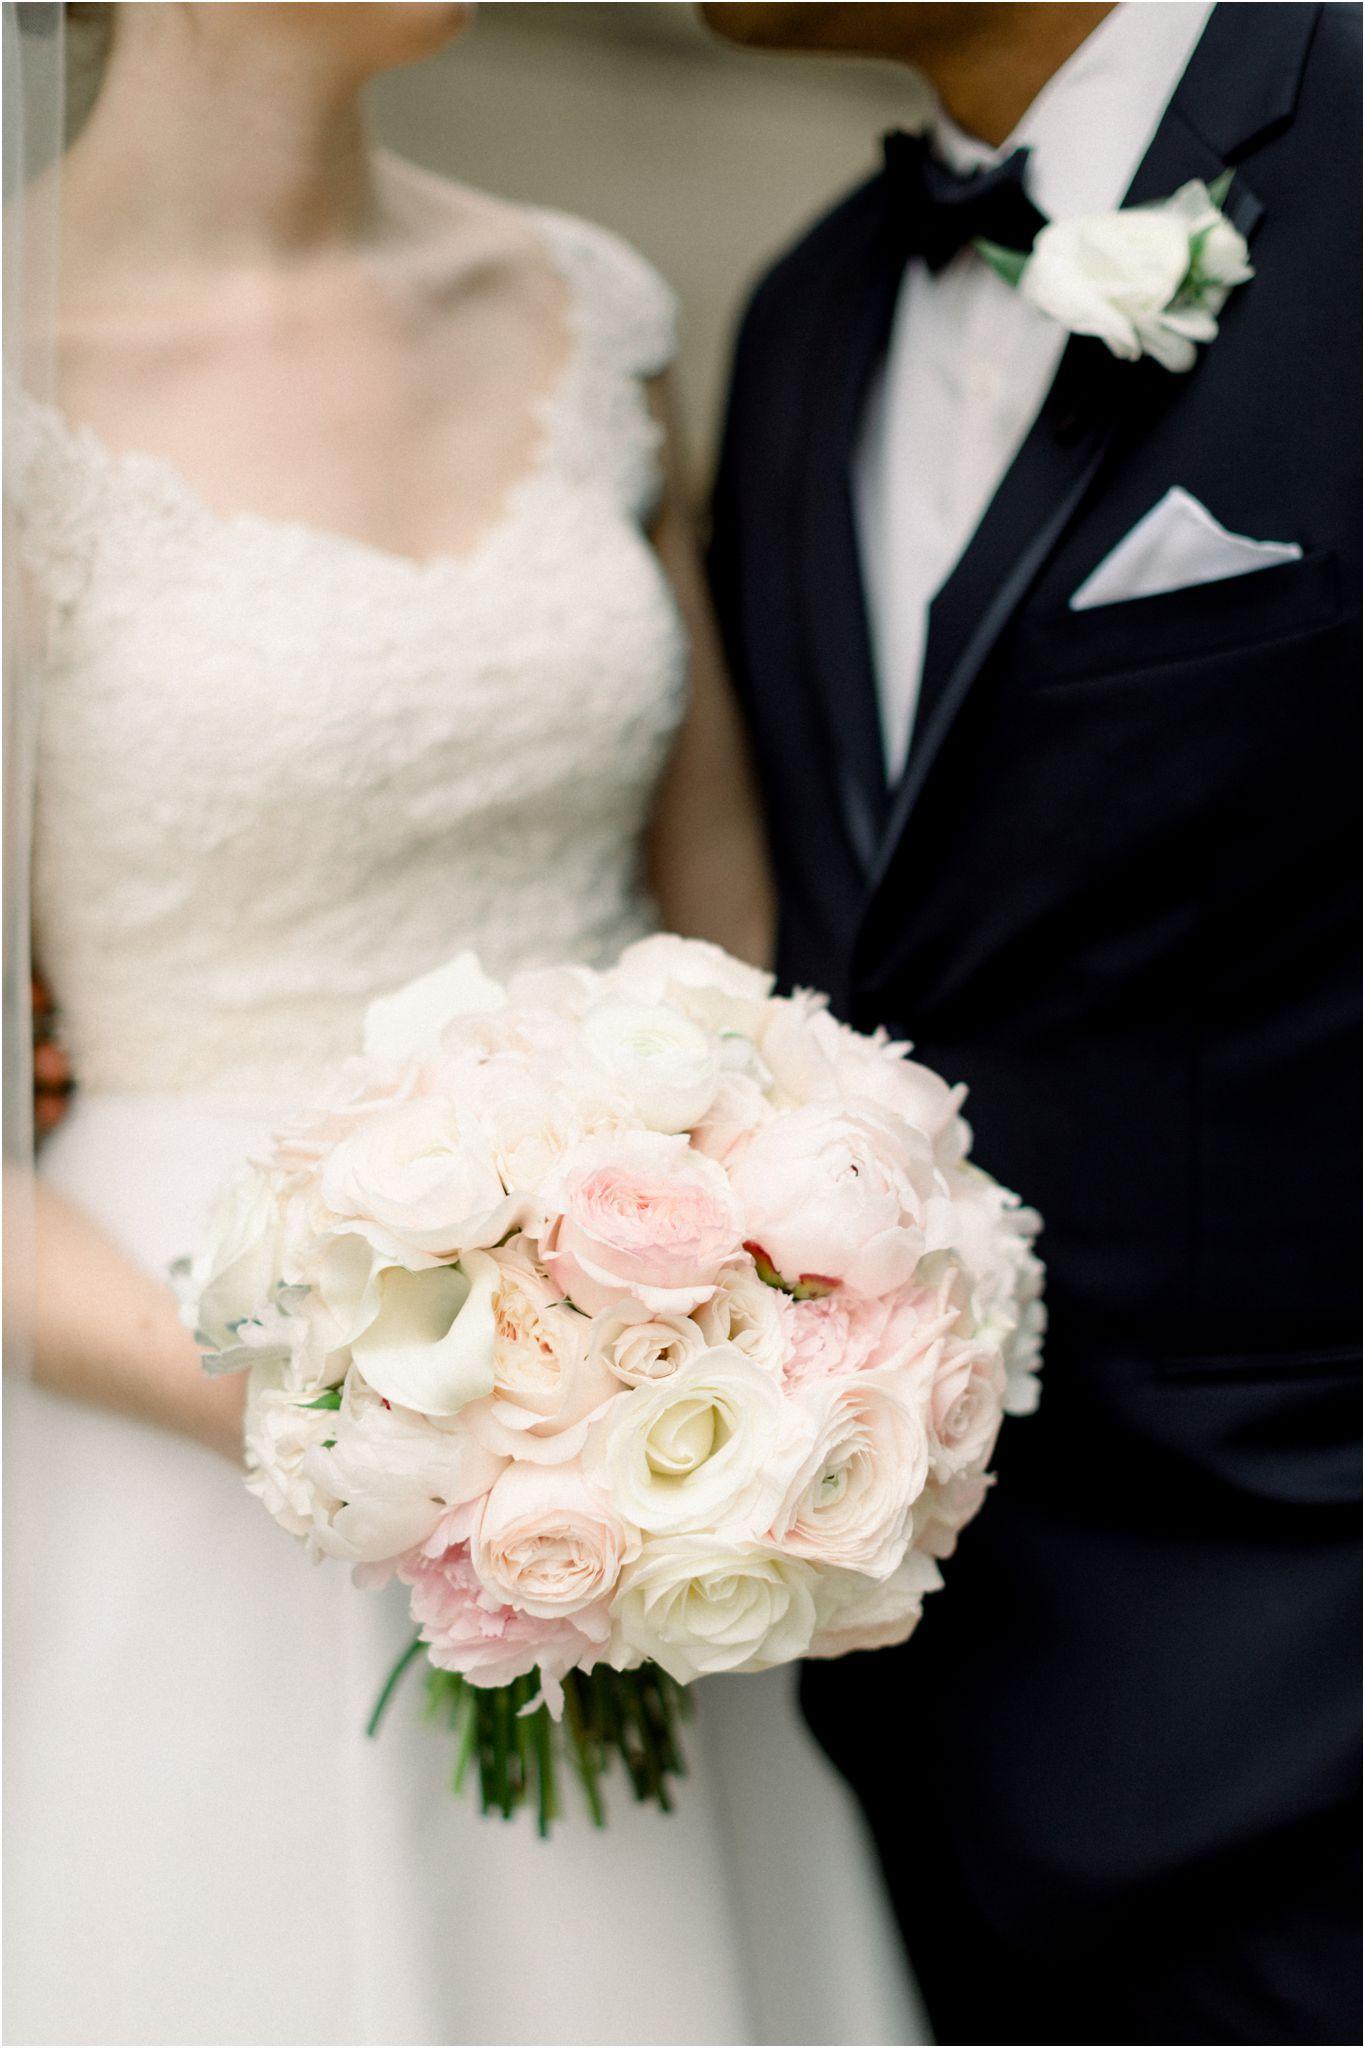 providence-public-library-wedding-images_00016.JPG